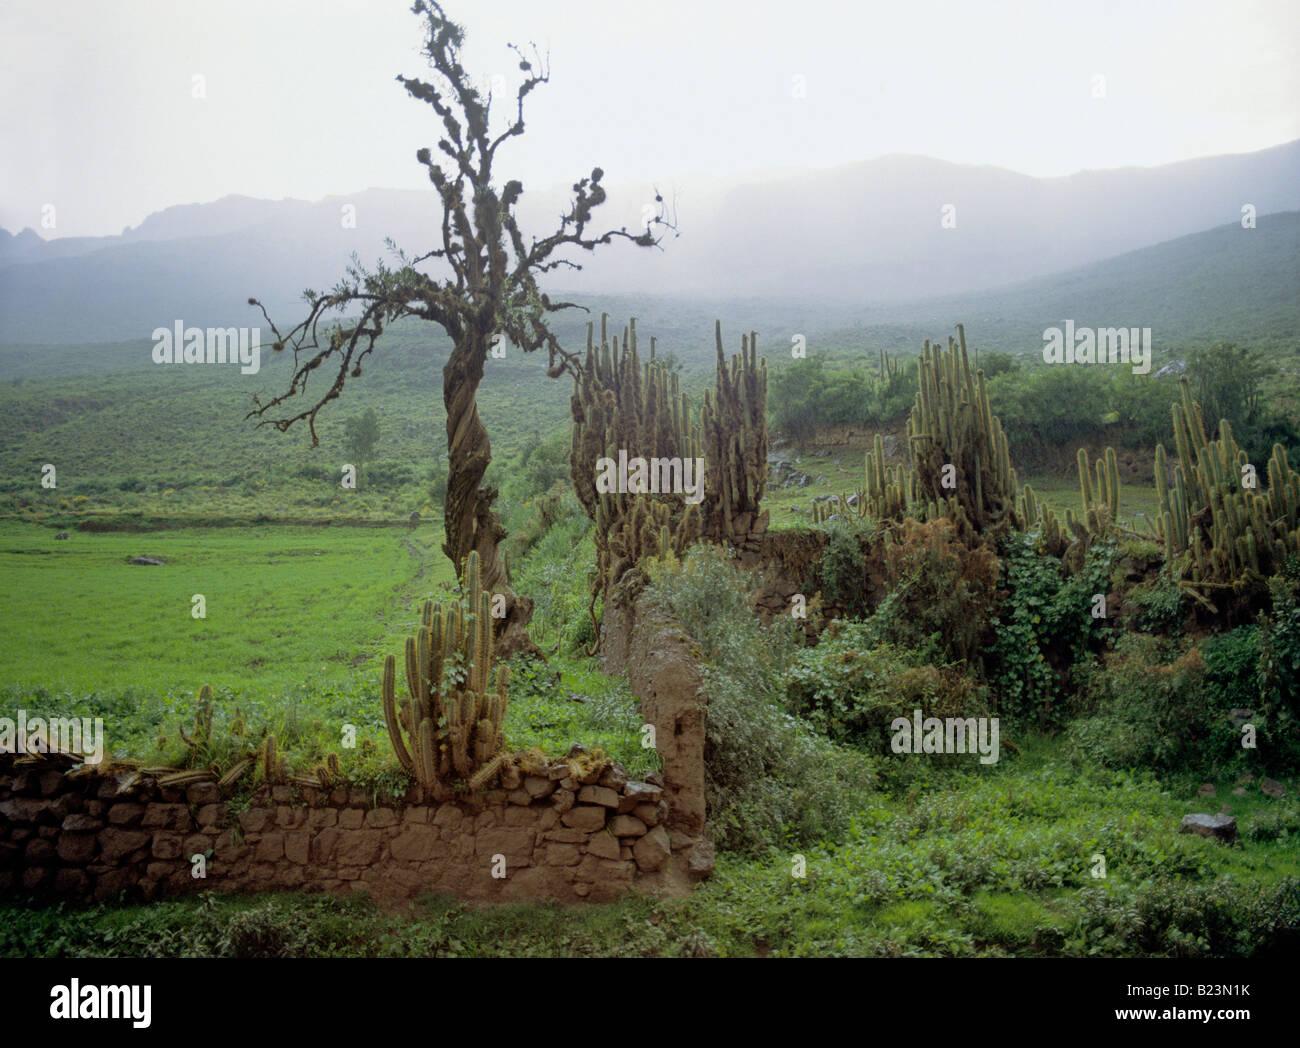 rain shower arable farm land urubamba valley andean highland peru - Stock Image